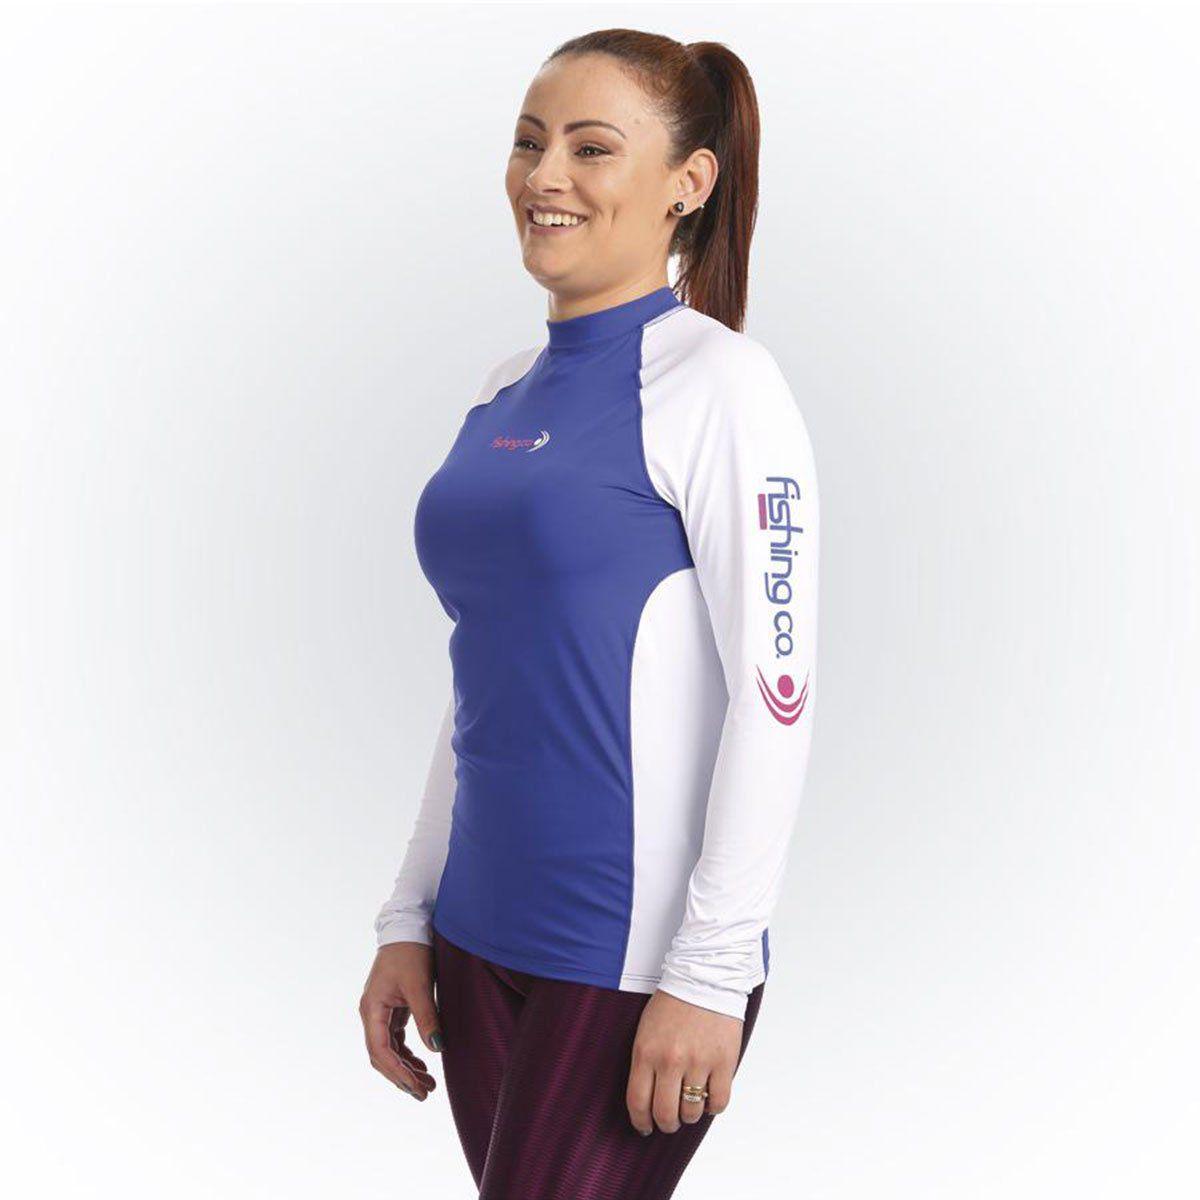 Camiseta Fishing Co Feminina com Recorte Royal e Branco